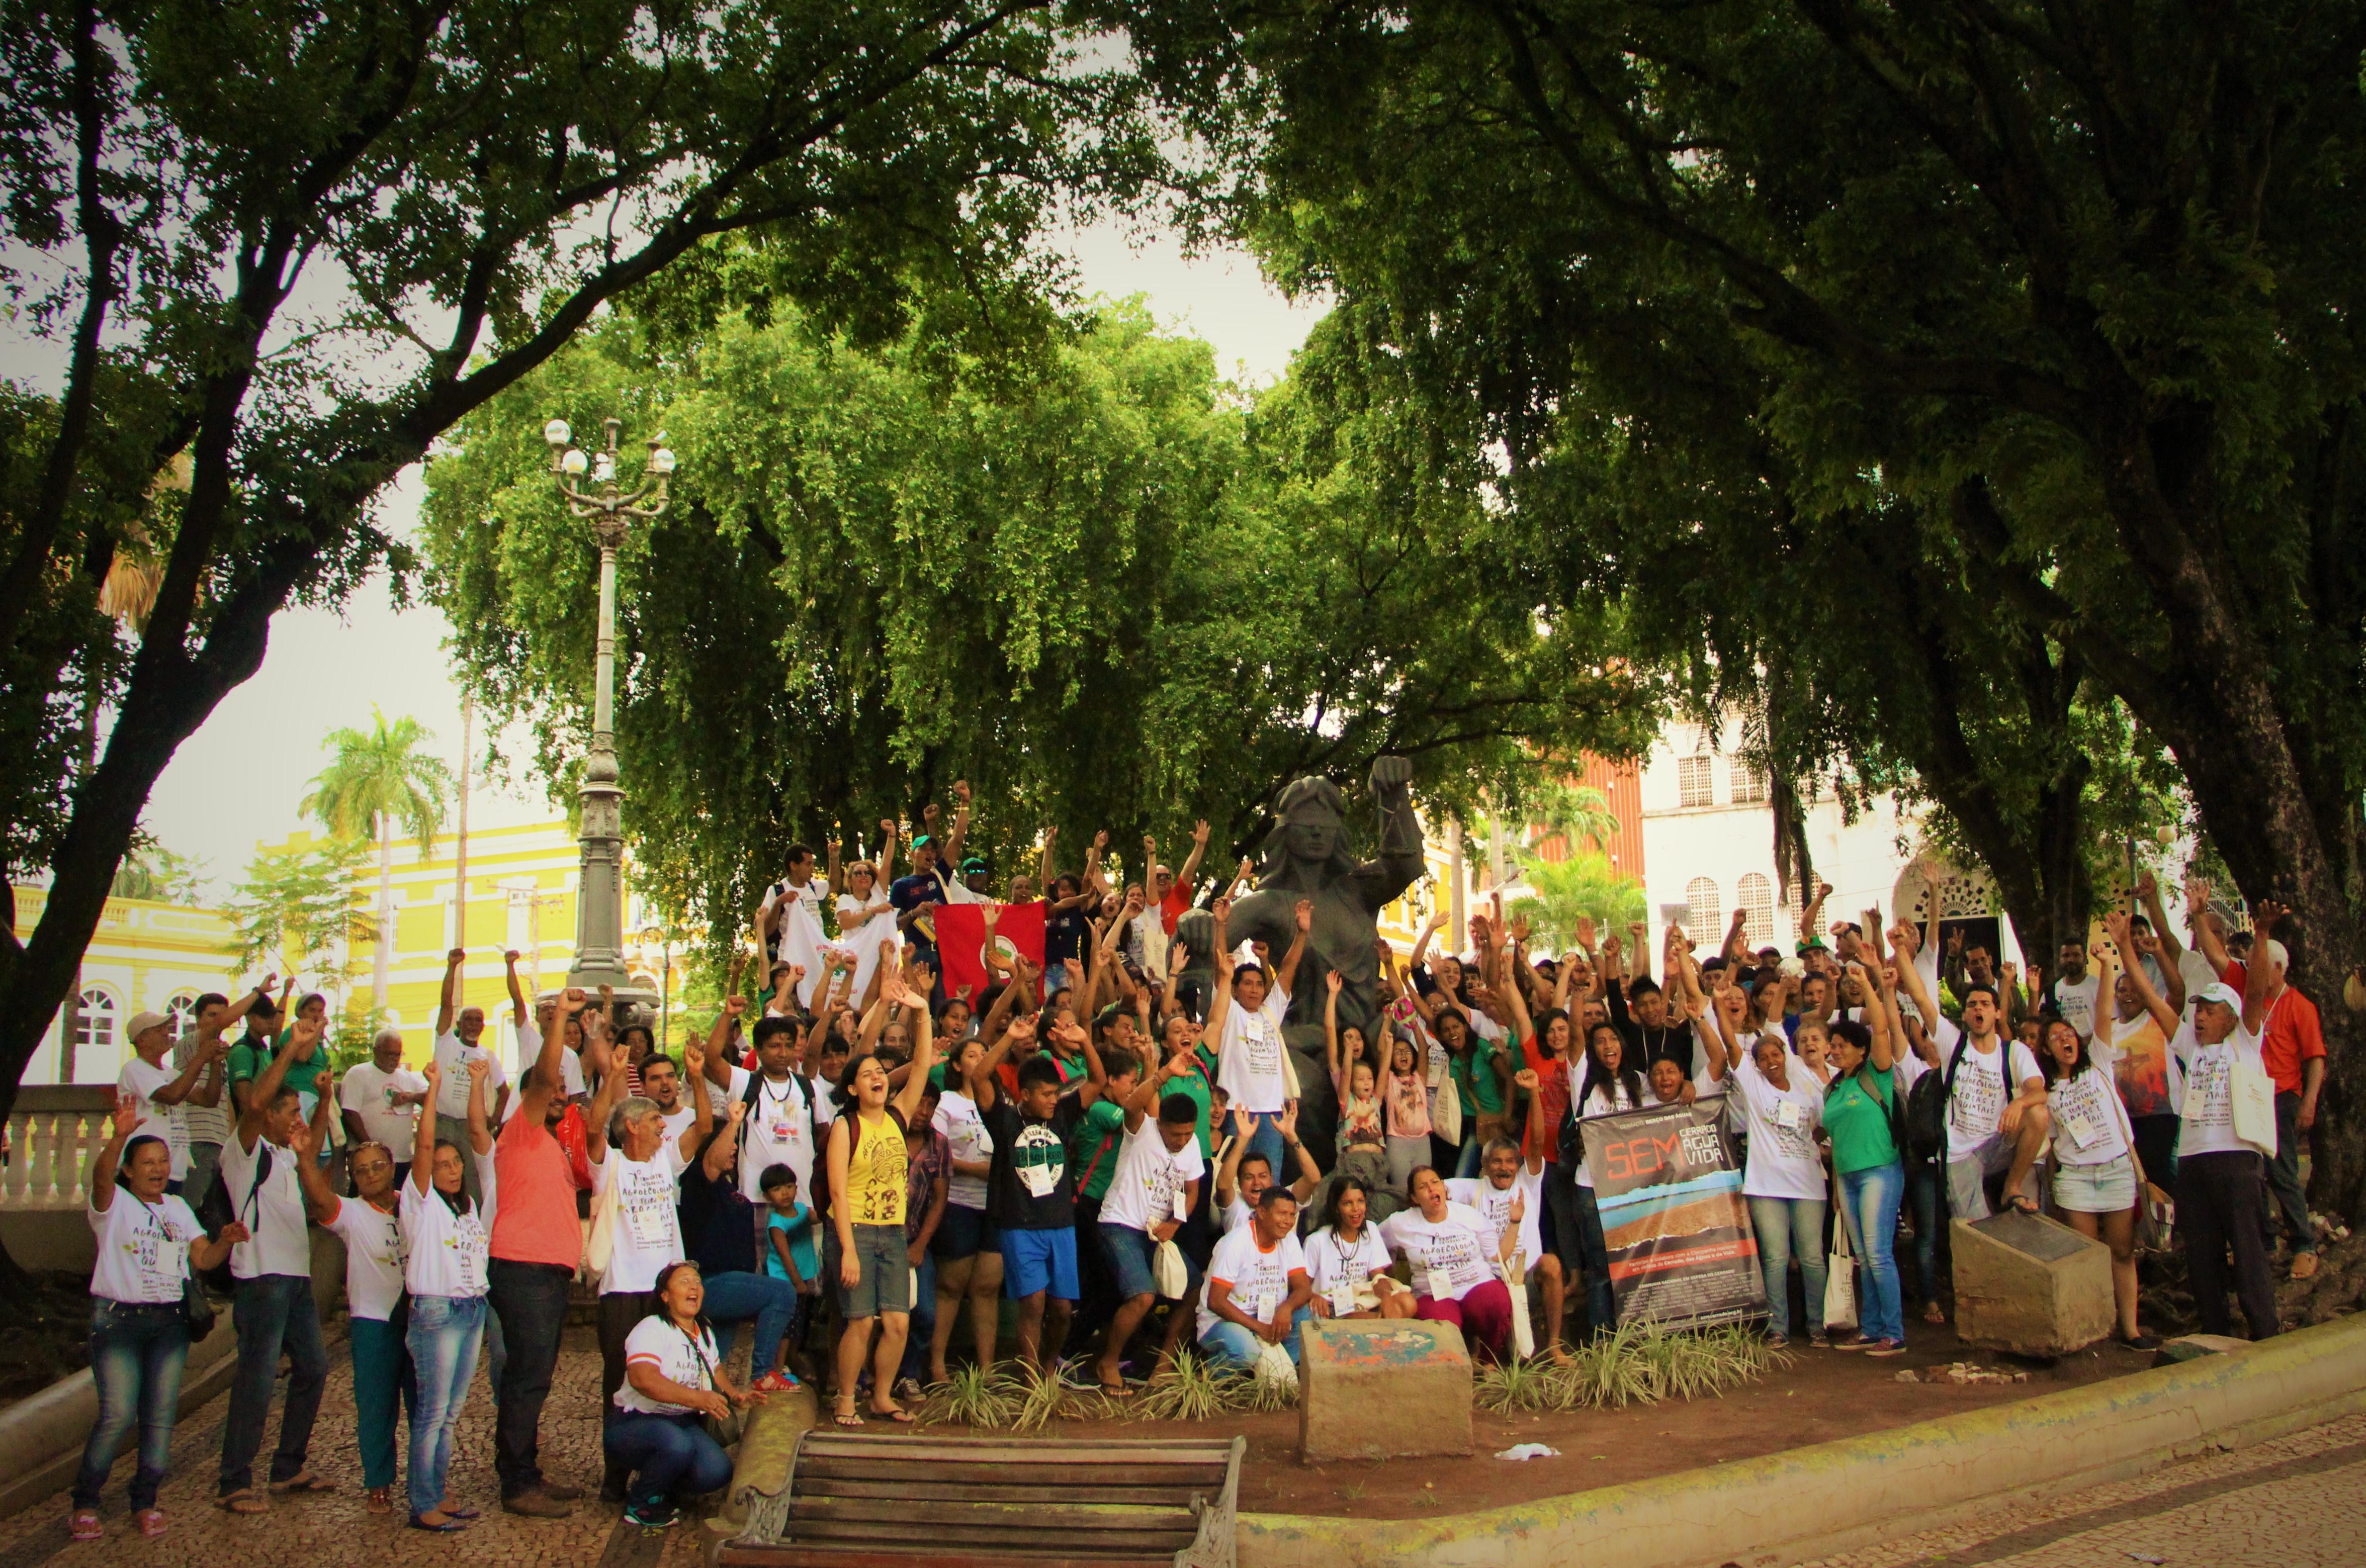 Encerramento do ato ao lado da estátua da Justiça. (Foto: Gilka Resende/FASE)